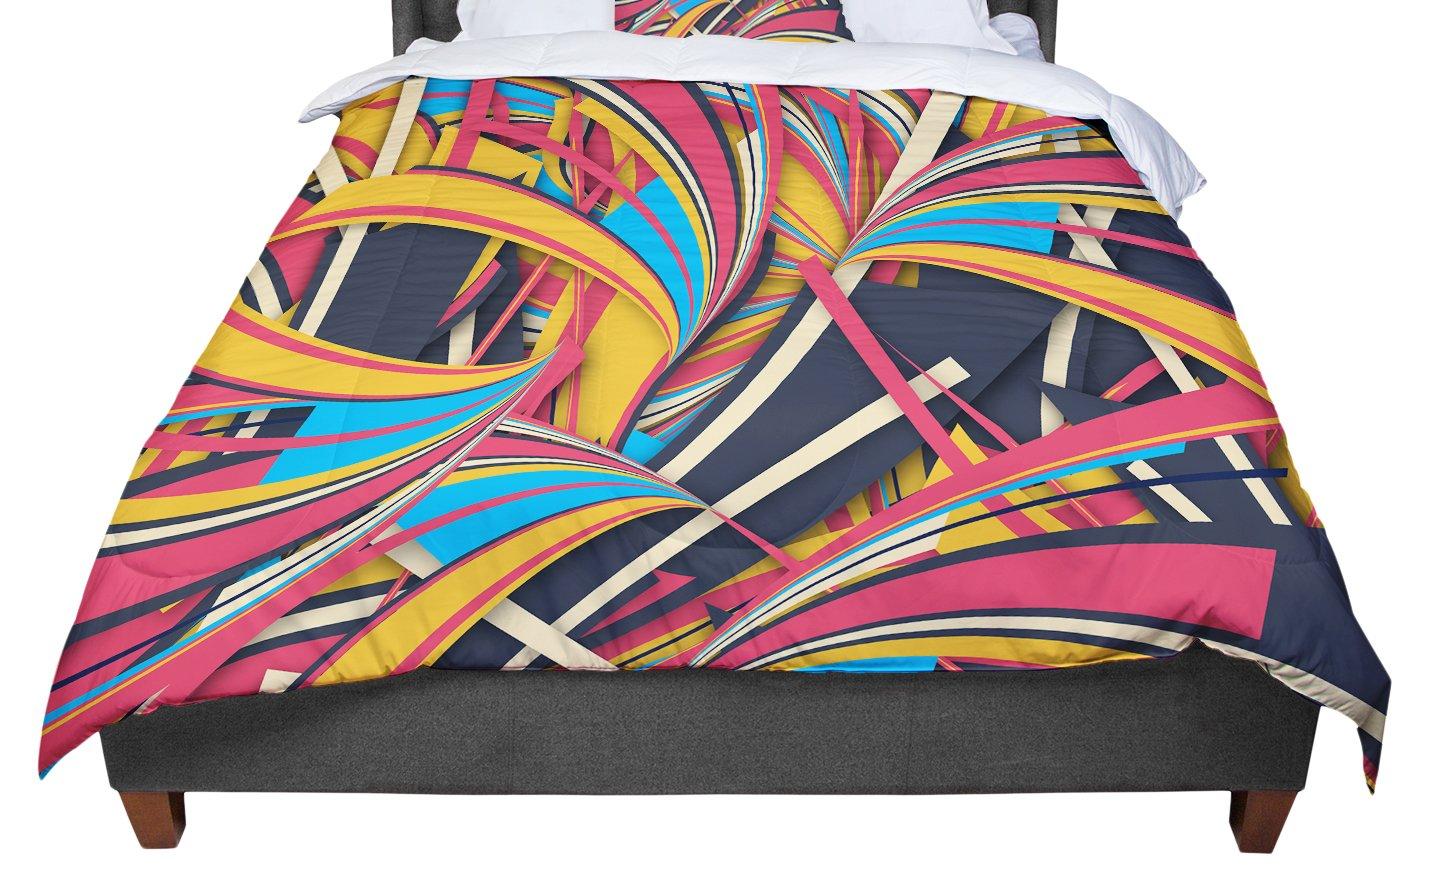 KESS InHouse Danny Ivan Slippery Slope Orange Blue Twin Comforter 68 X 88